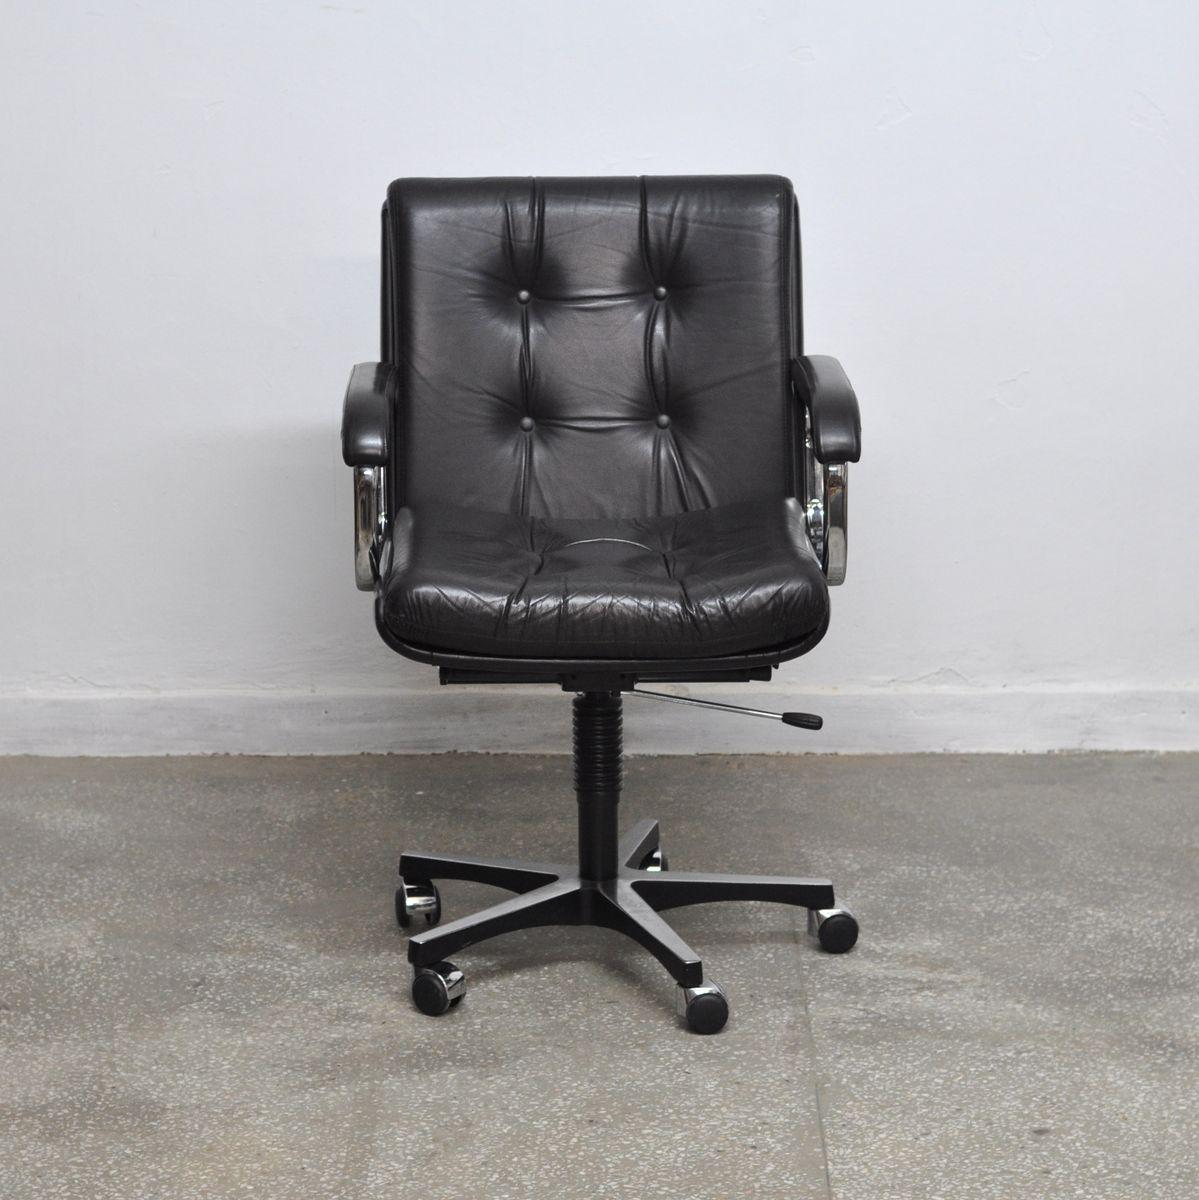 ergonomic chair norway swing cad block vintage norwegian office from ring mekanikk for sale